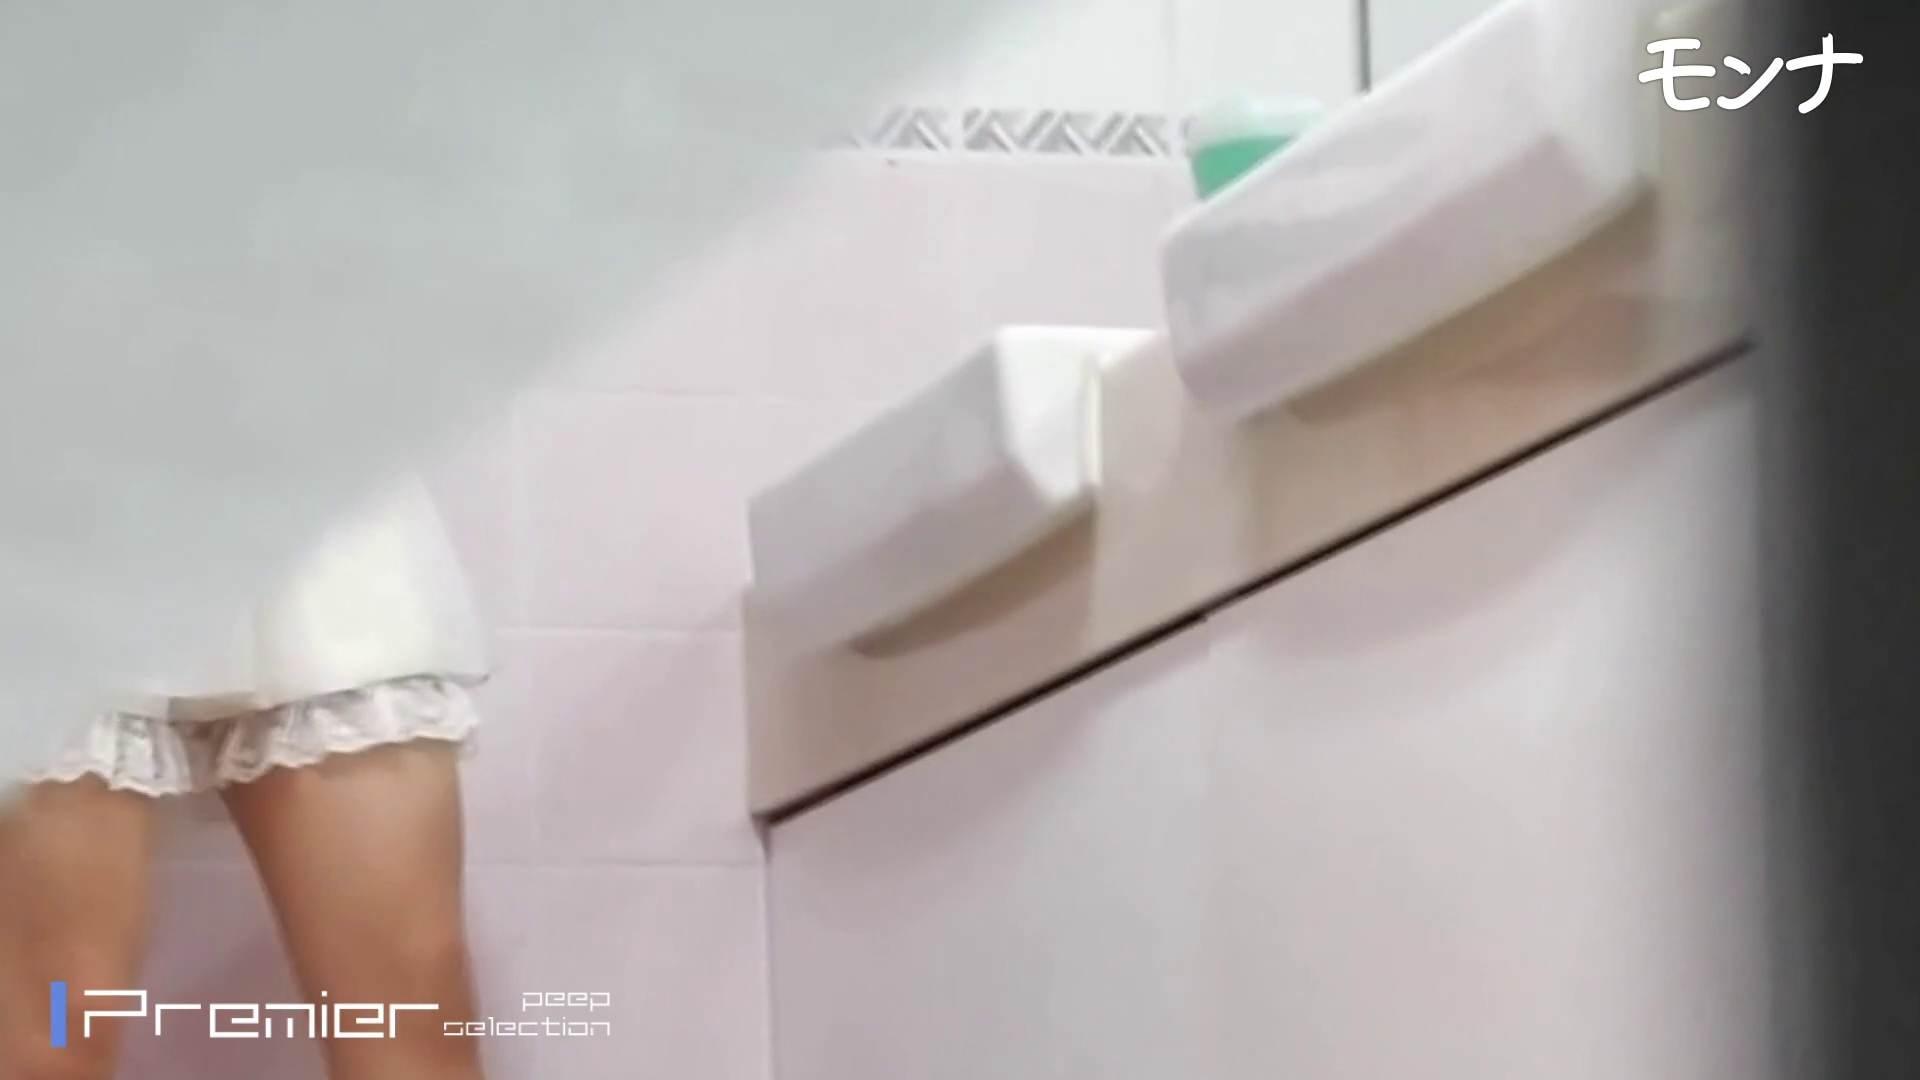 CM 悶絶シリーズ5 【美しい日本の未来 No.128】 お姉さんのSEX オマンコ無修正動画無料 111枚 64